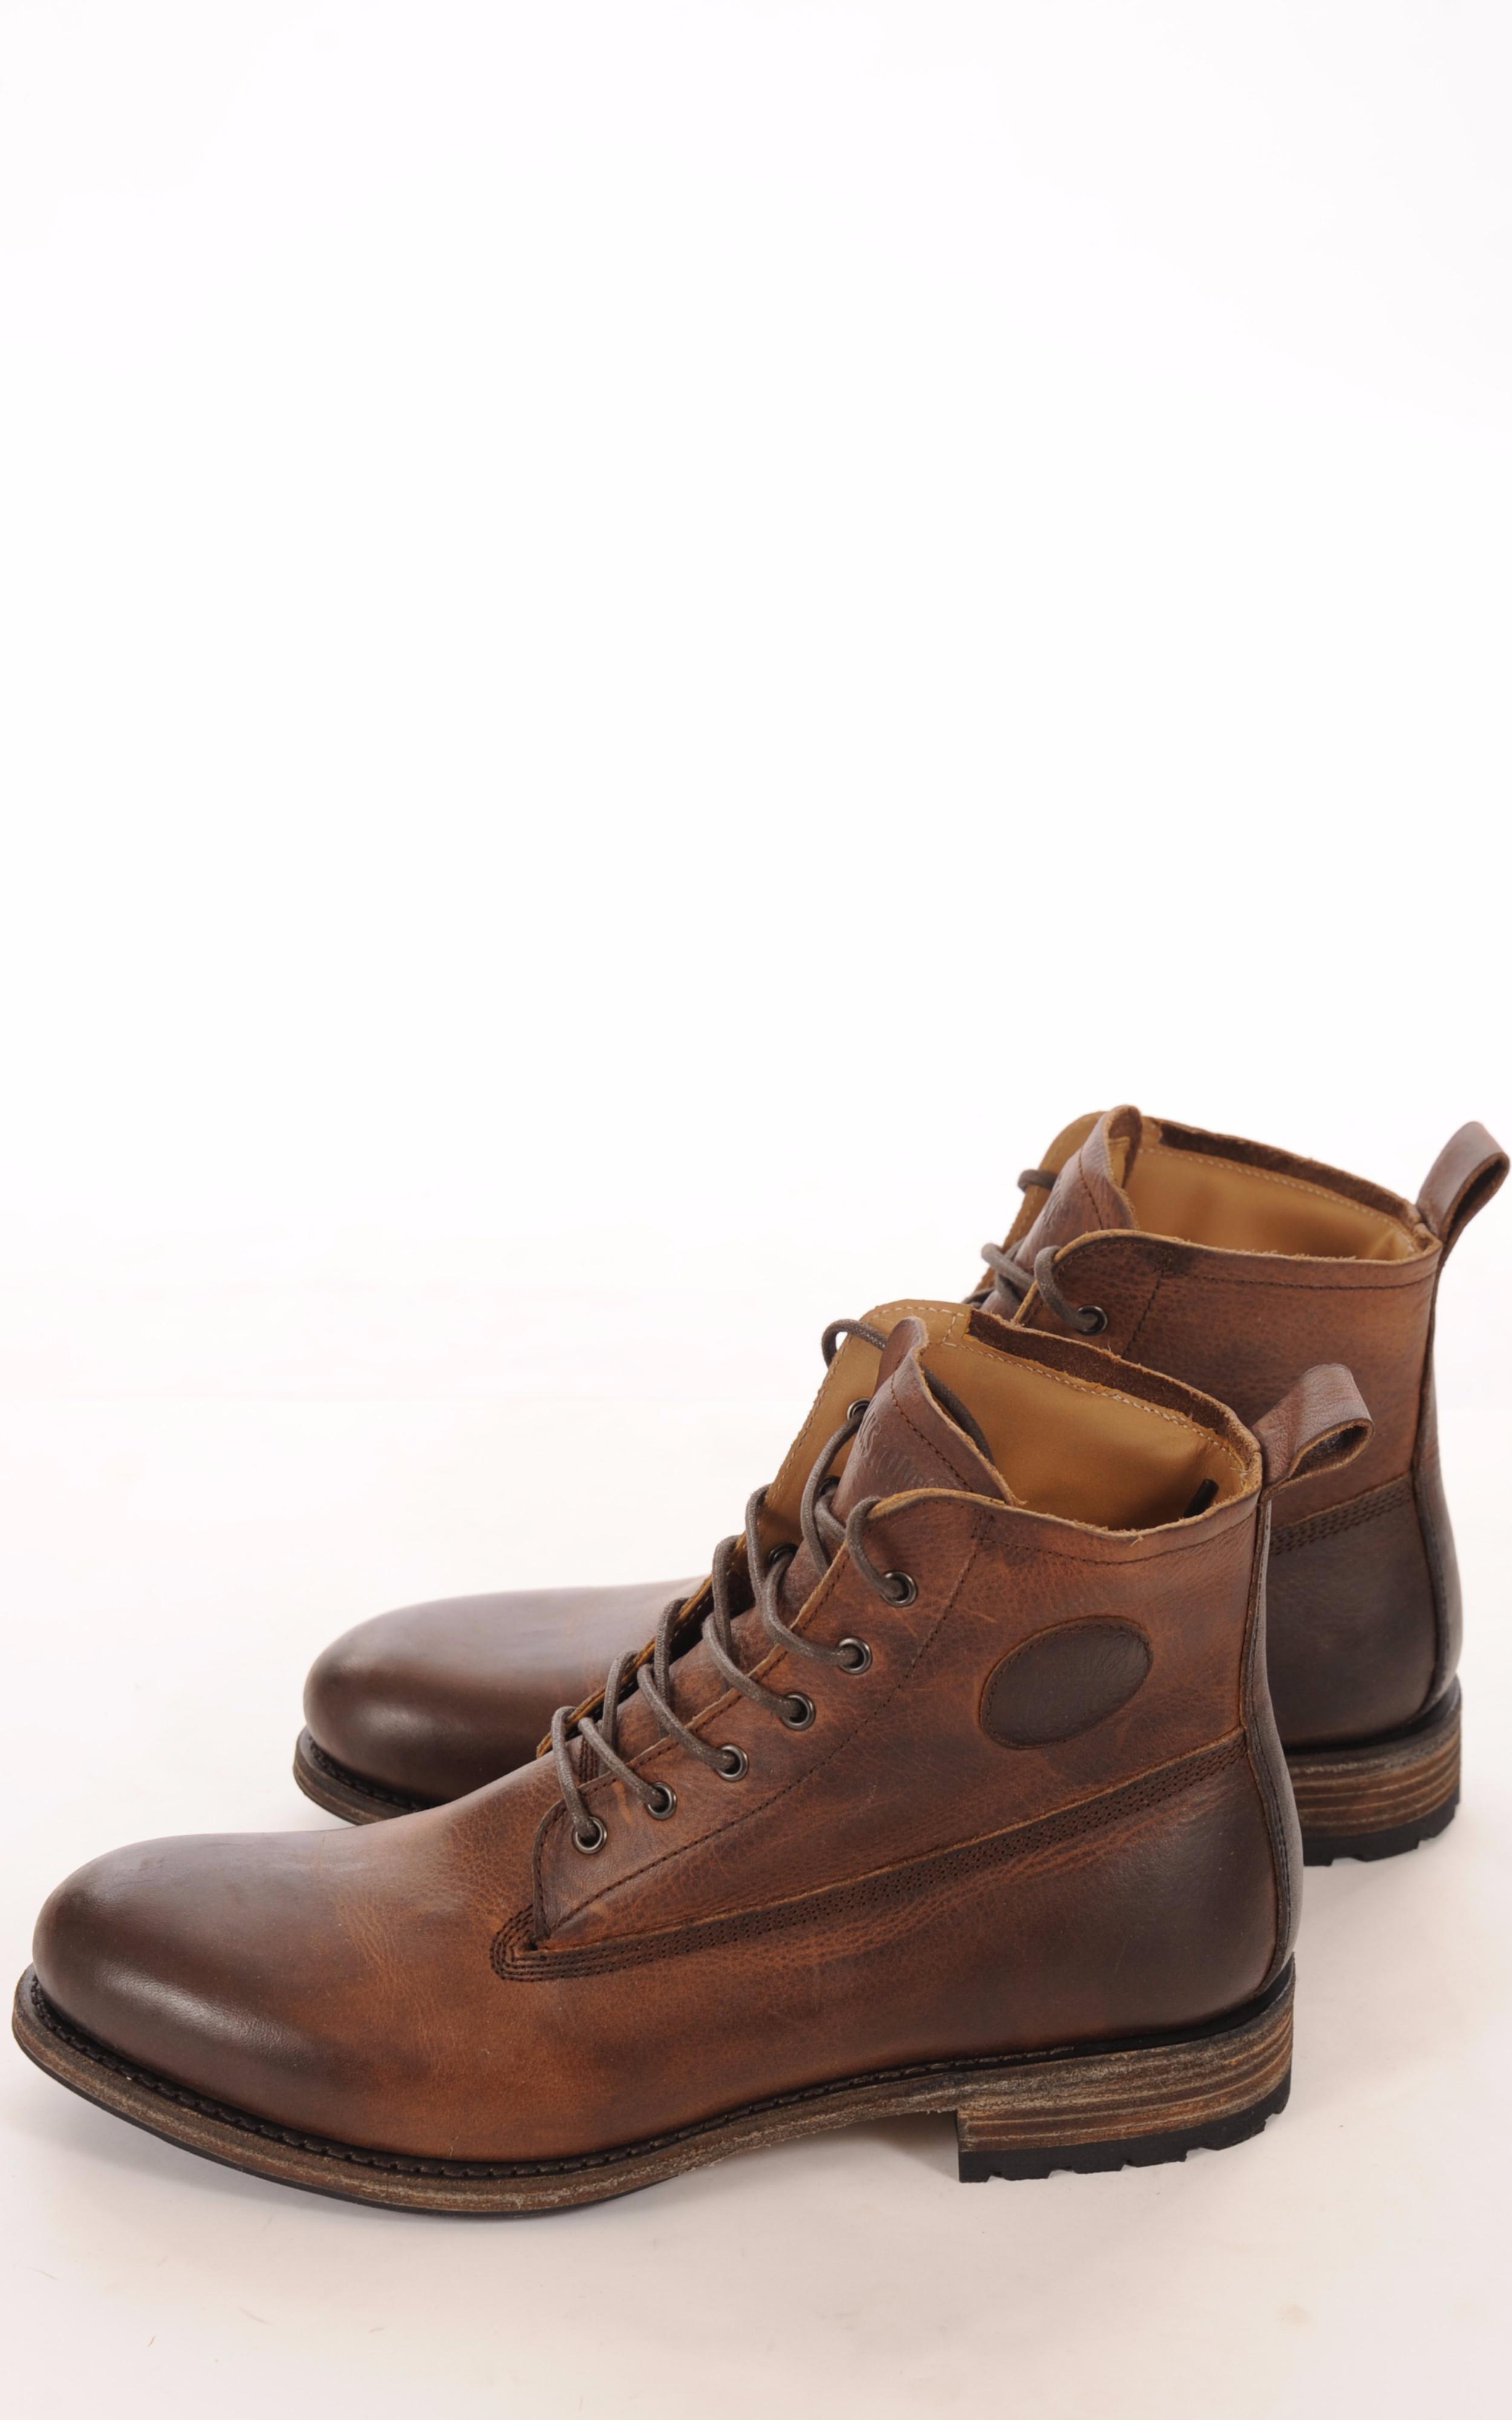 Boots Cuir Marron Vieilli Mouton Blackstone